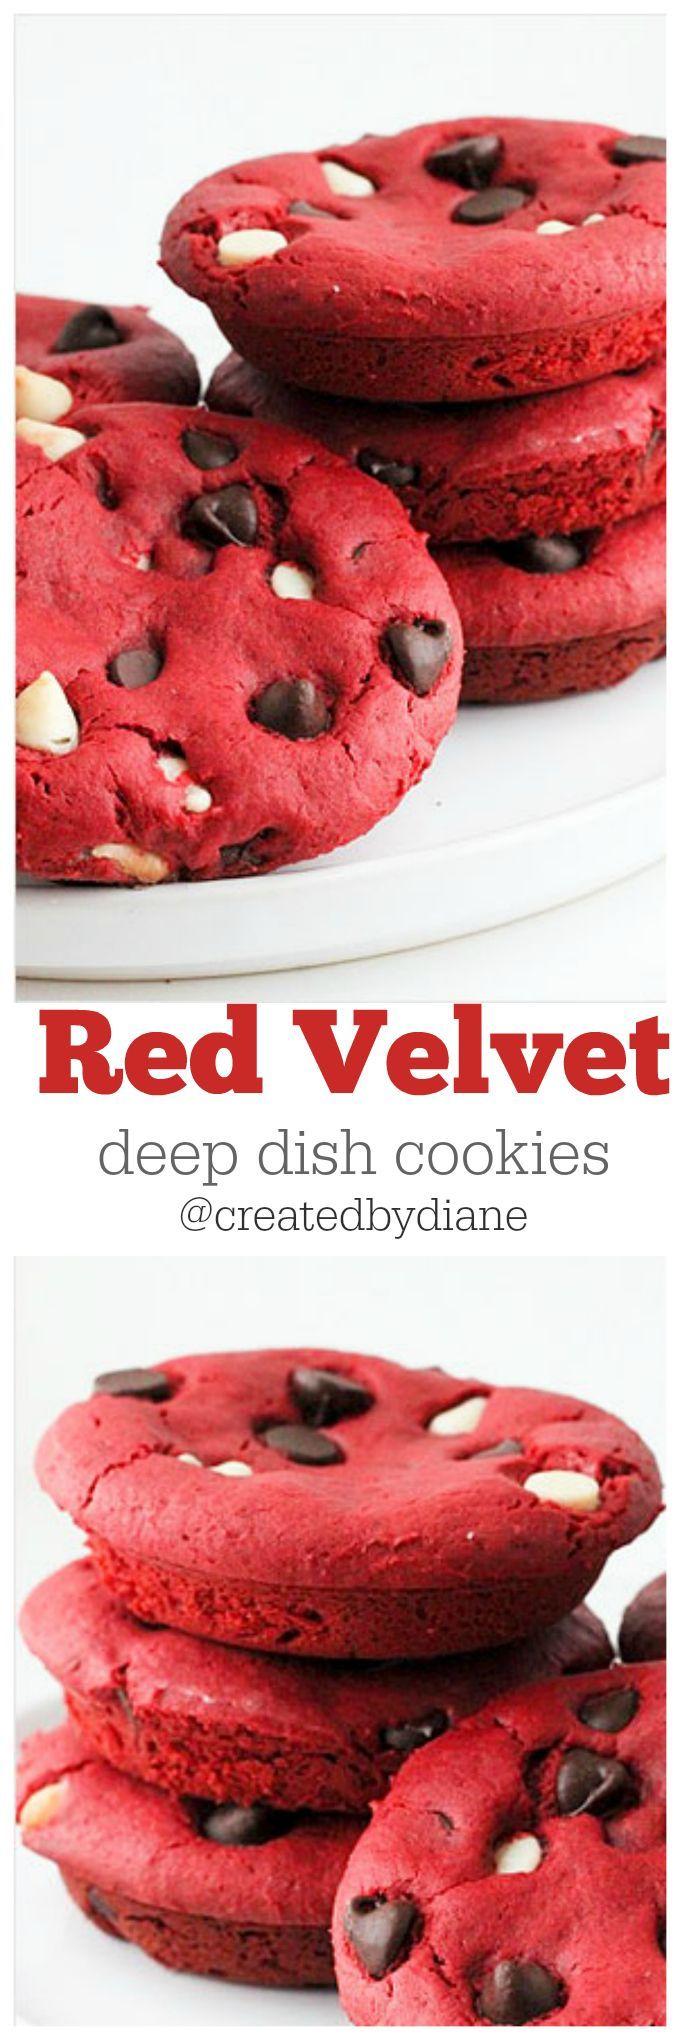 red velvet deep dish cookies @createdbydiane